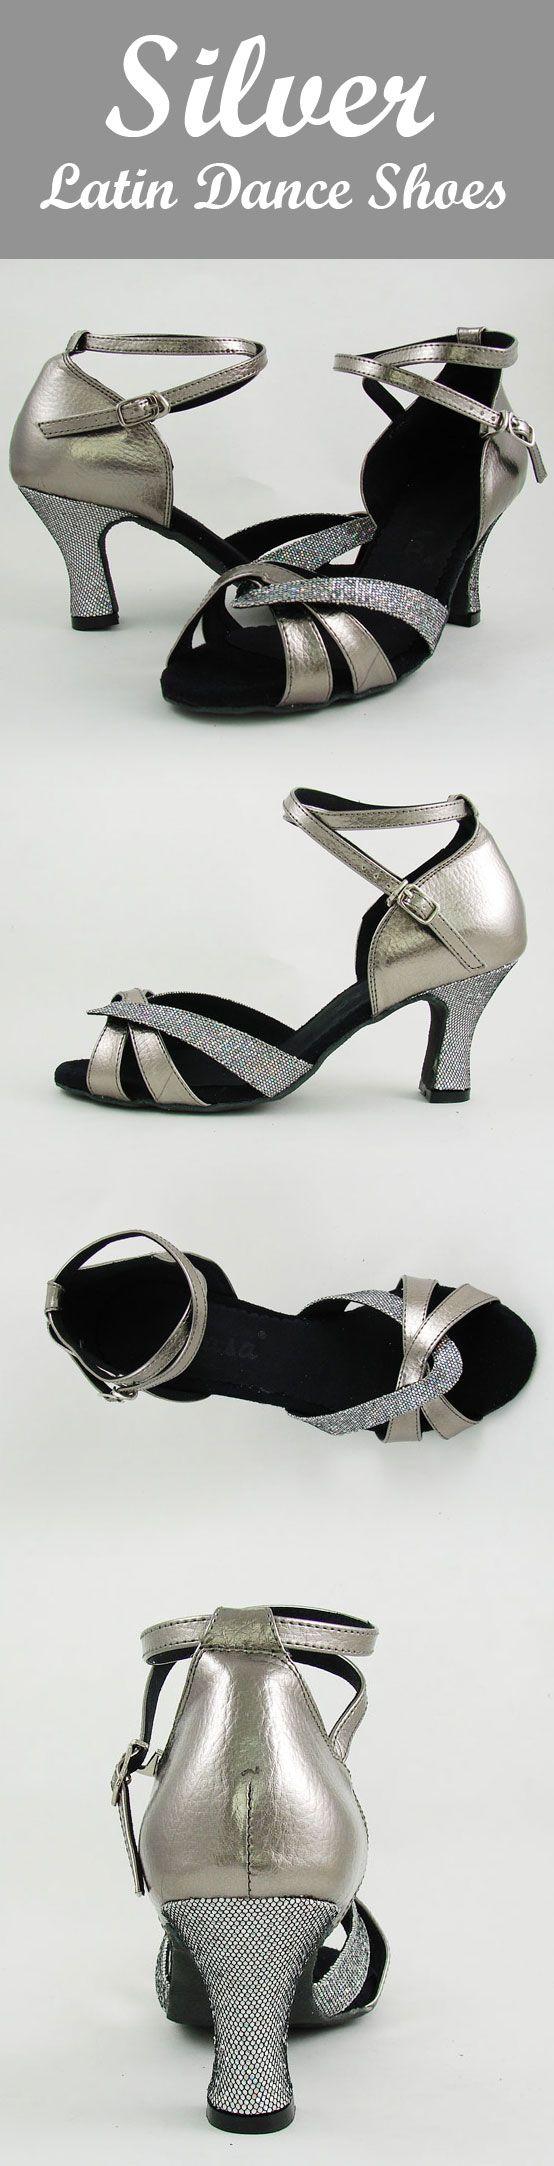 9amlatin.com: Latin Dance Shoes for Women. Color: Silver. Shoe size